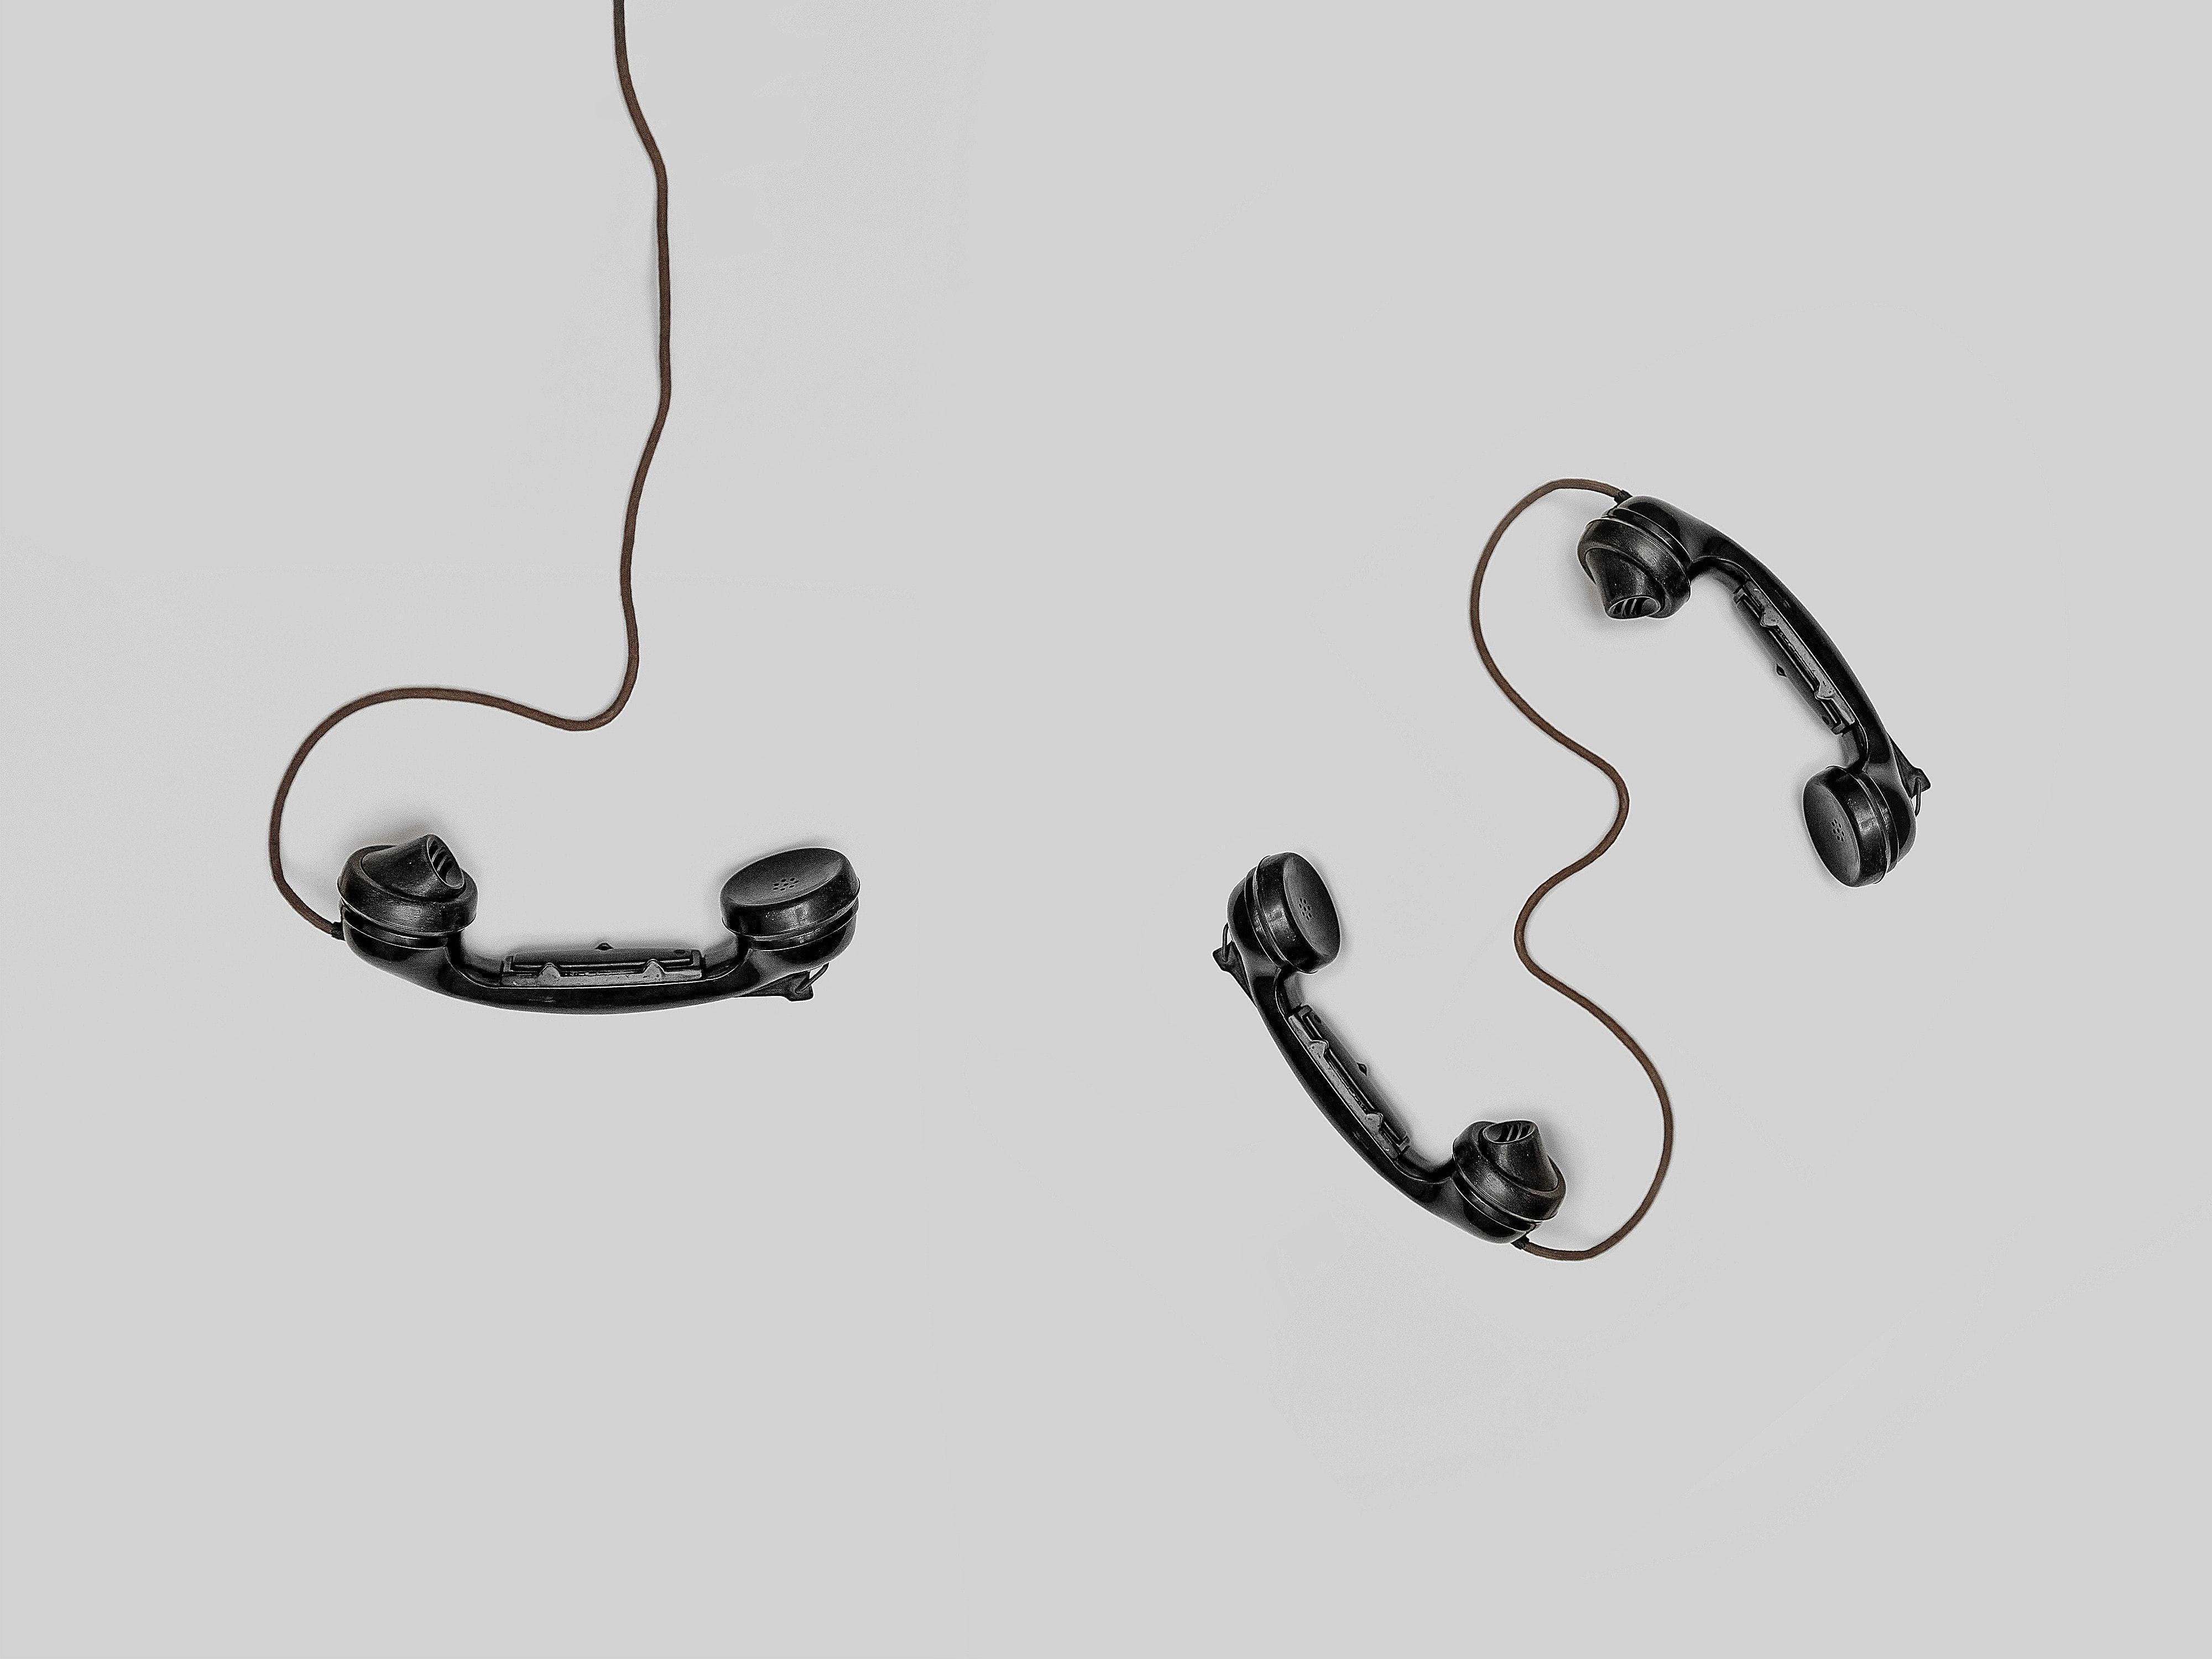 three-black-handset-toys-821754